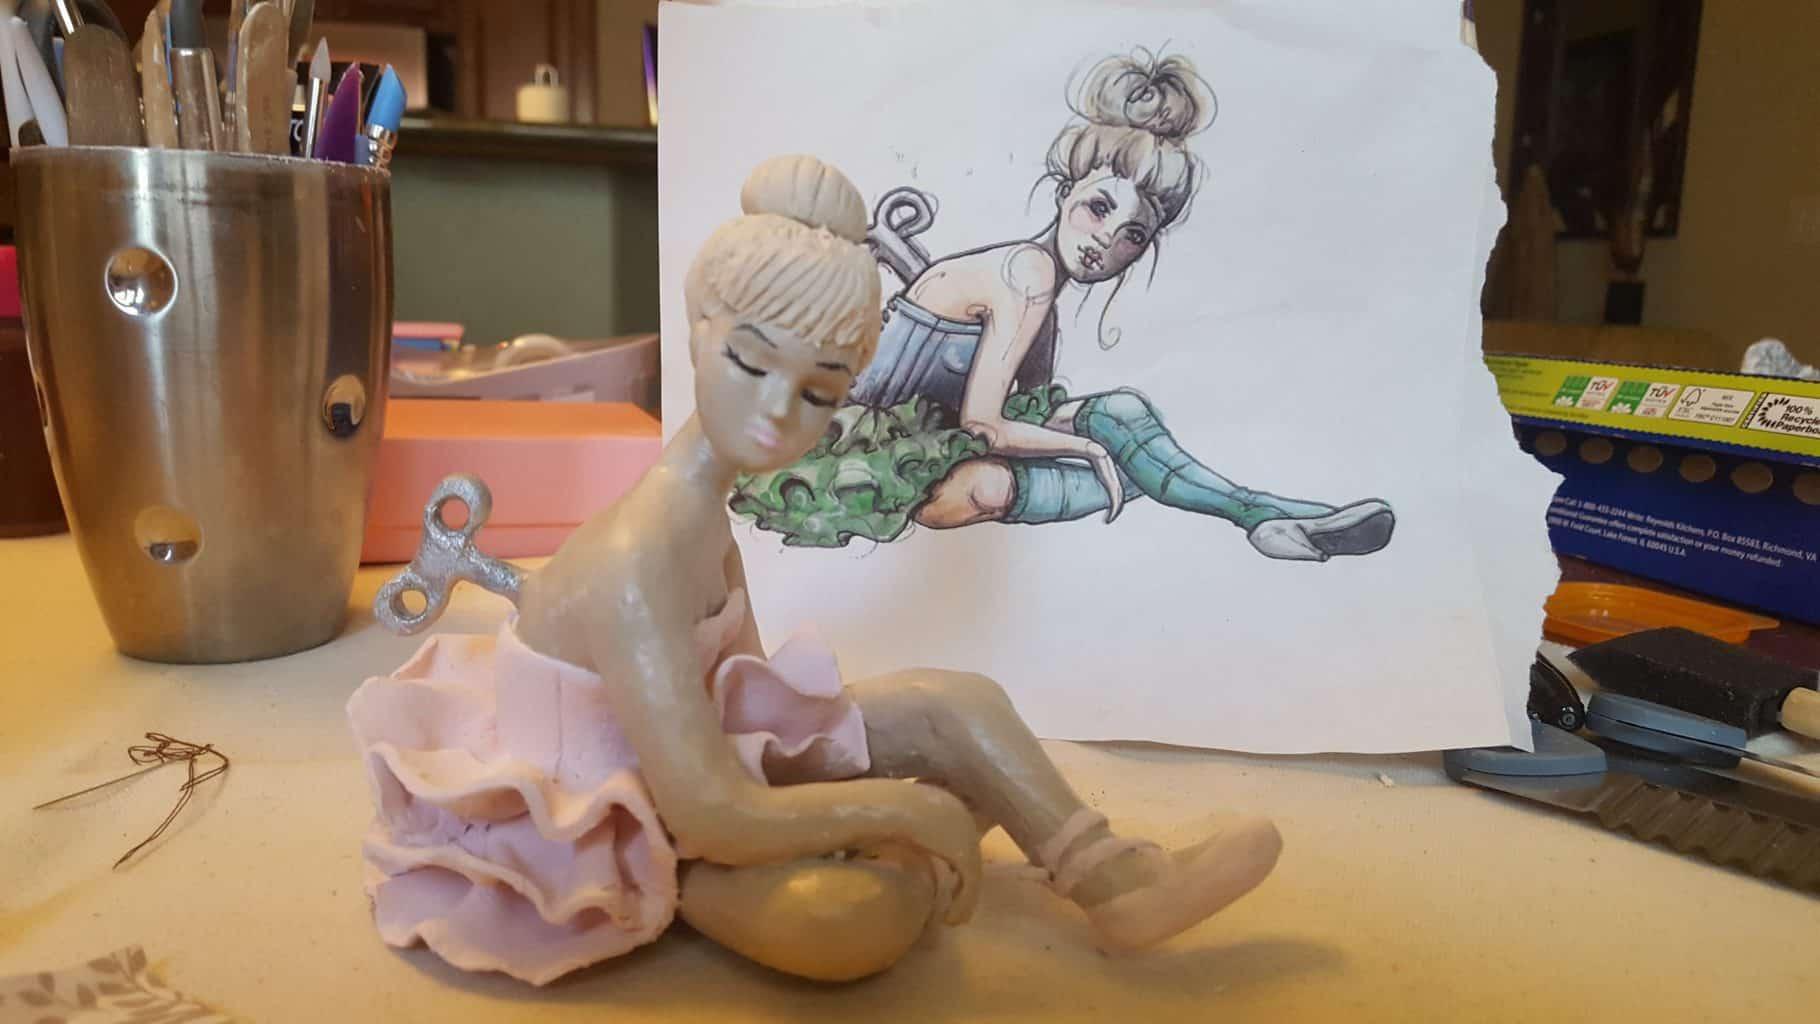 Tiny Dancer sculpture